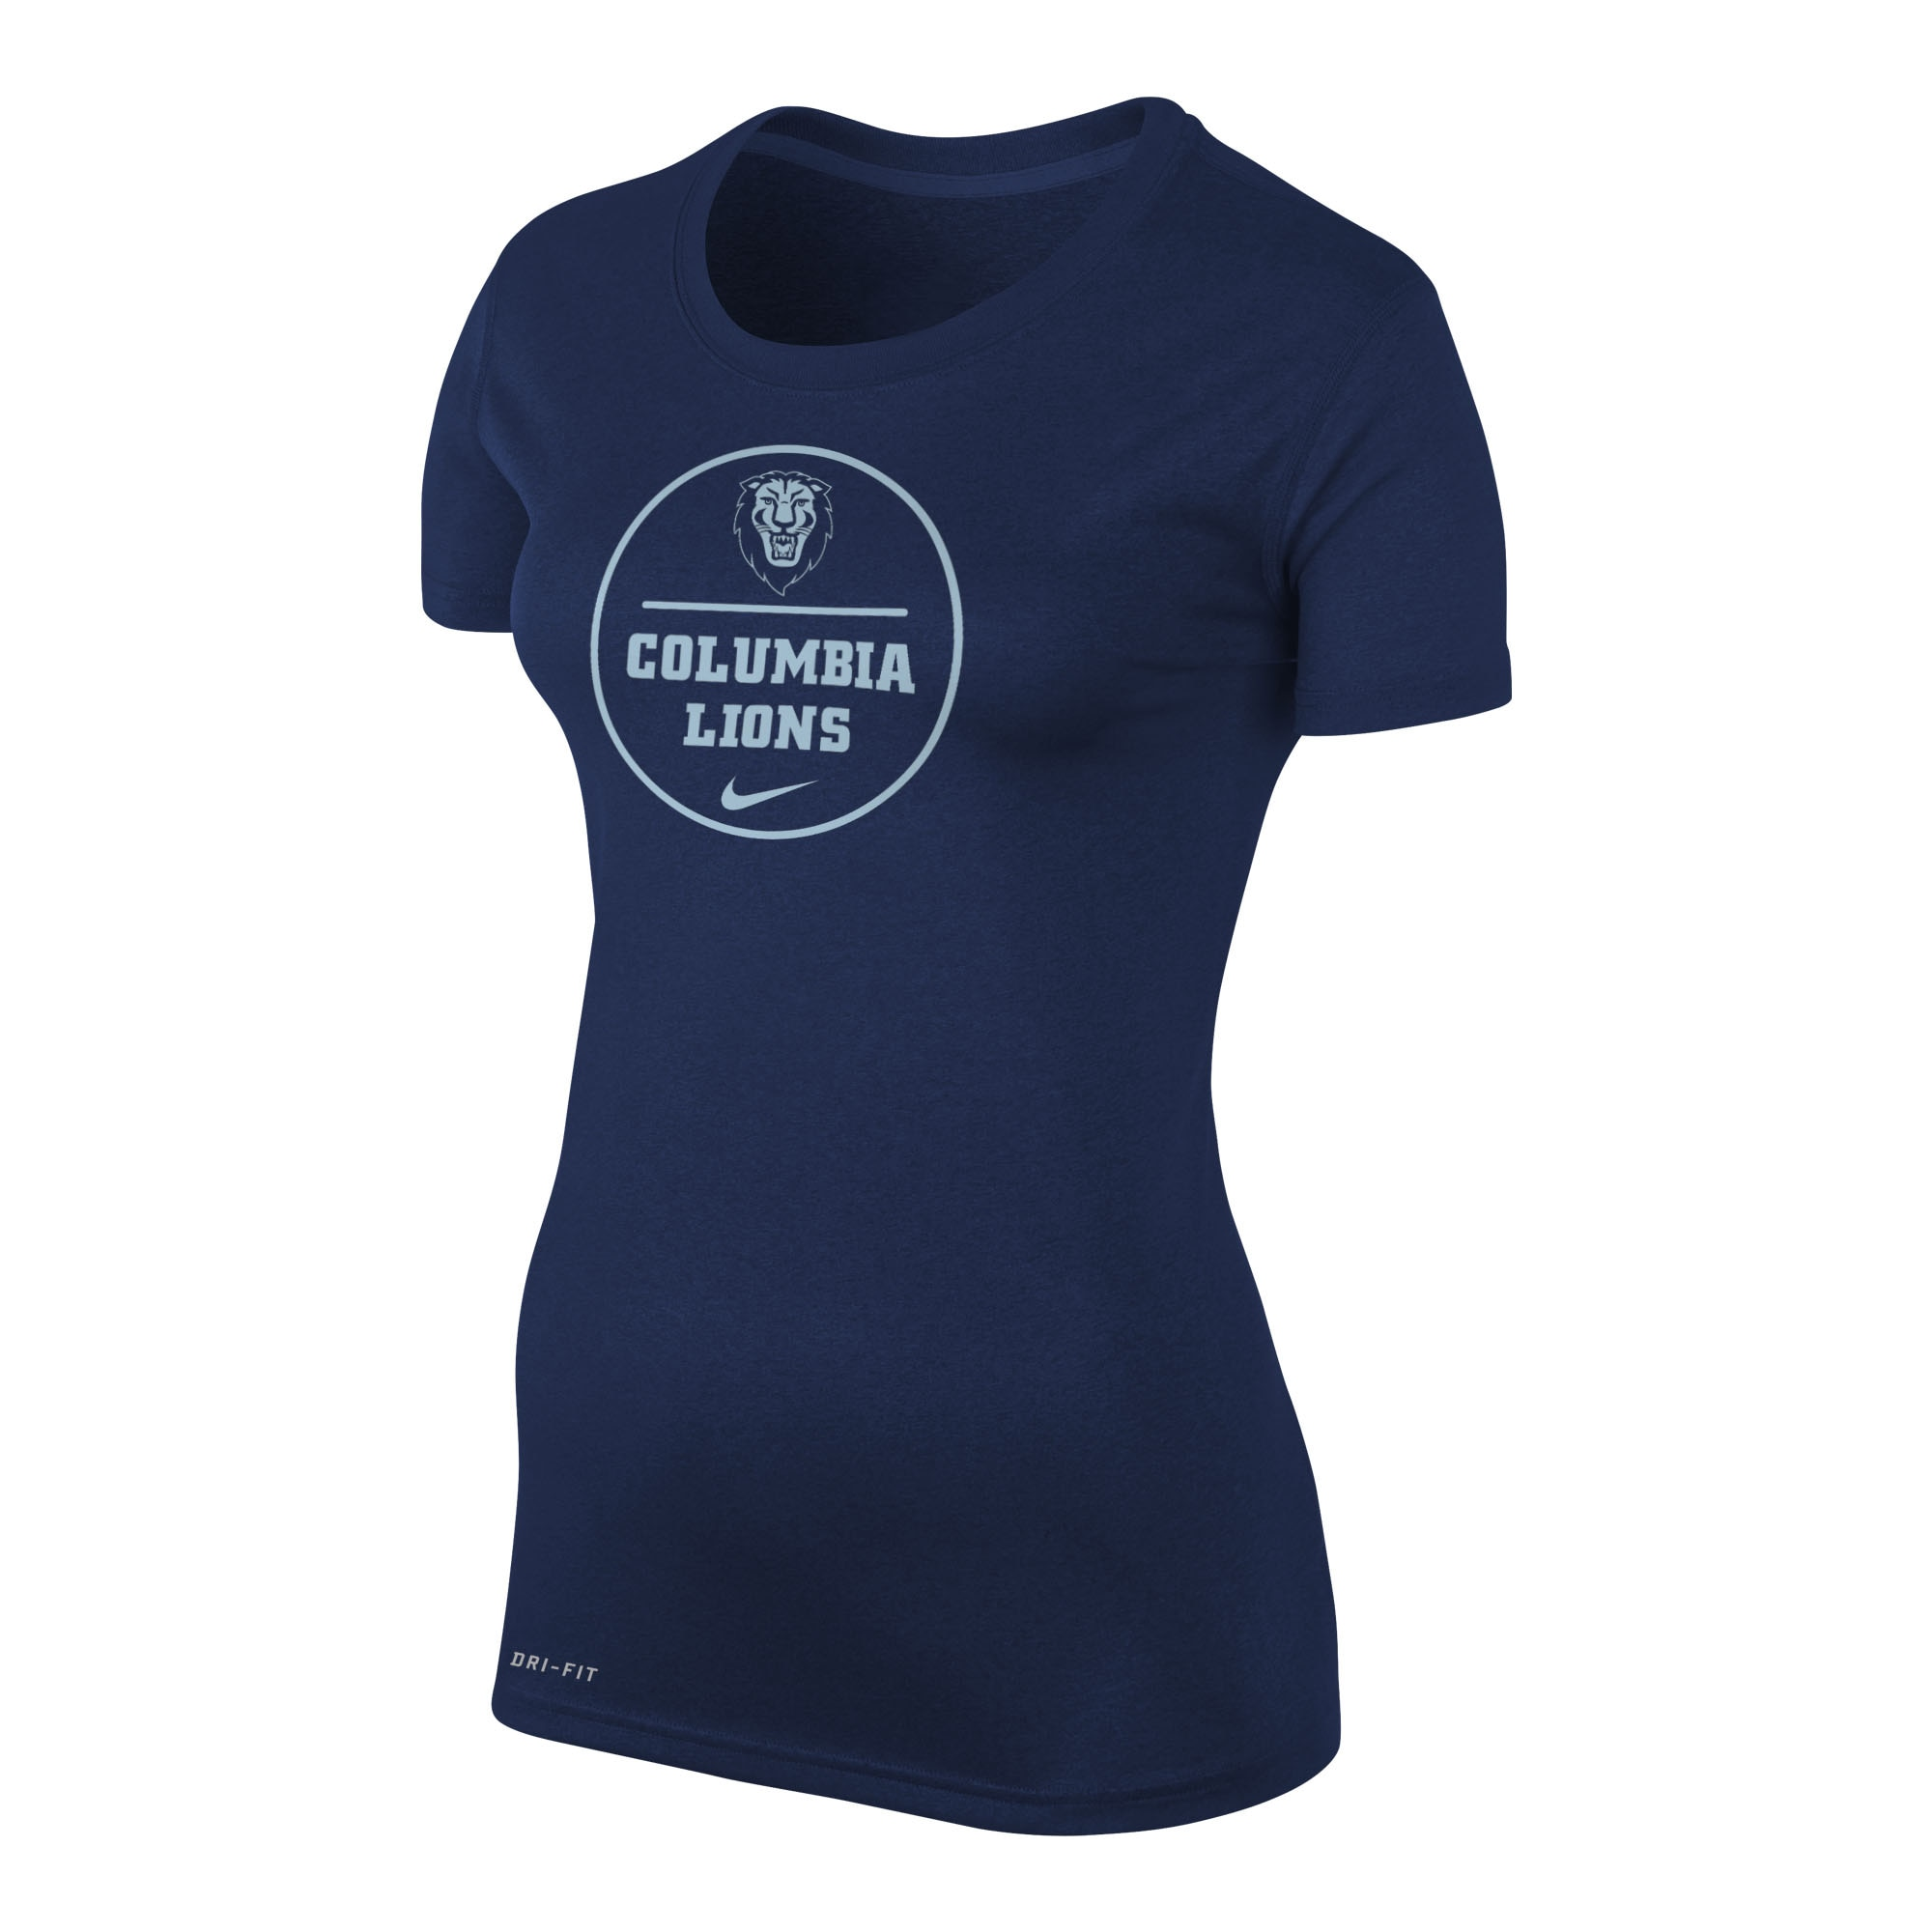 Columbia University Women's Dri Fit T-Shirt